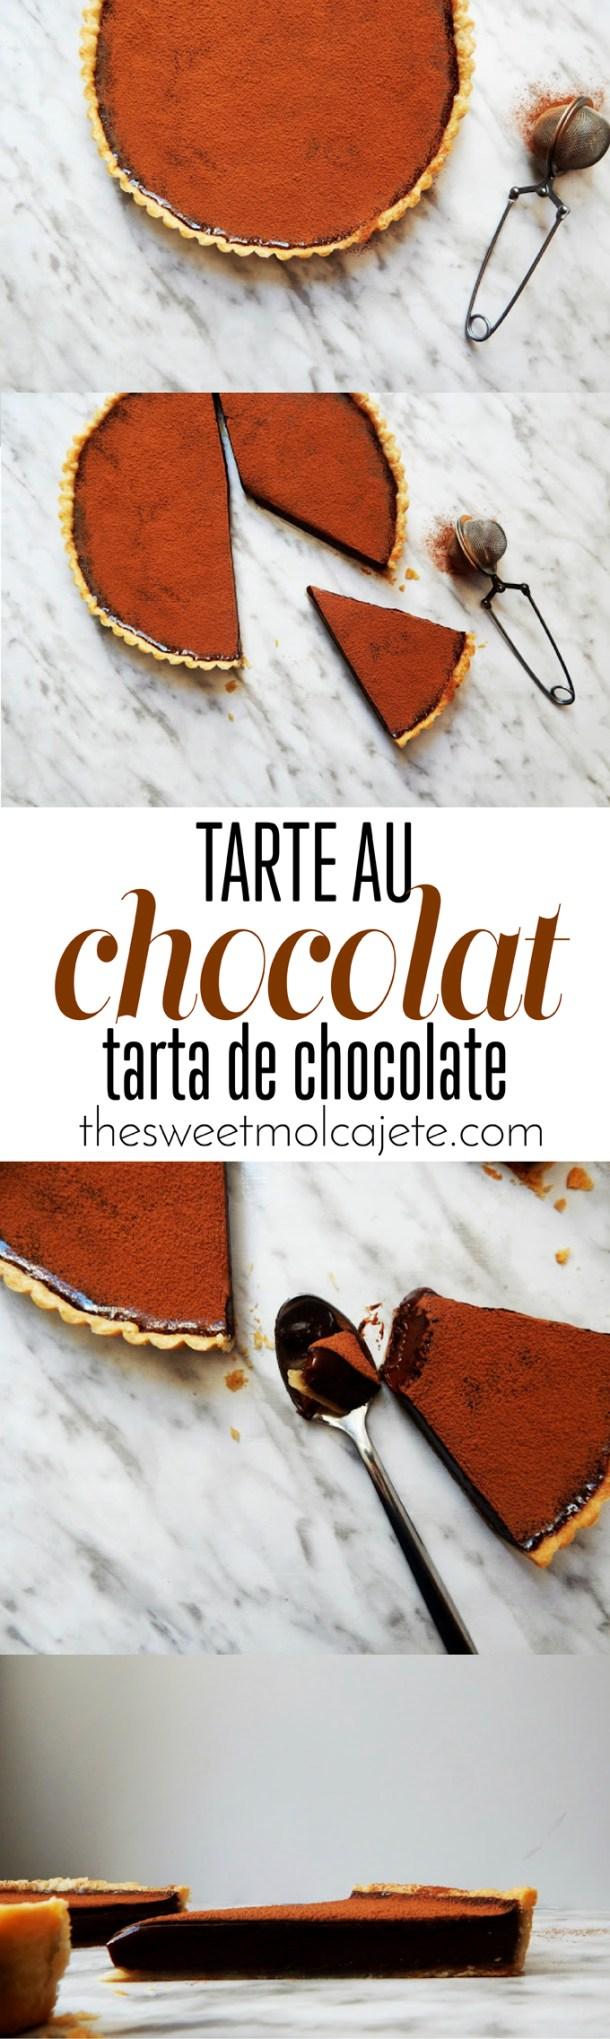 Tart Au Chocolat {Tarta de Chocolate} por @brunisboulanger